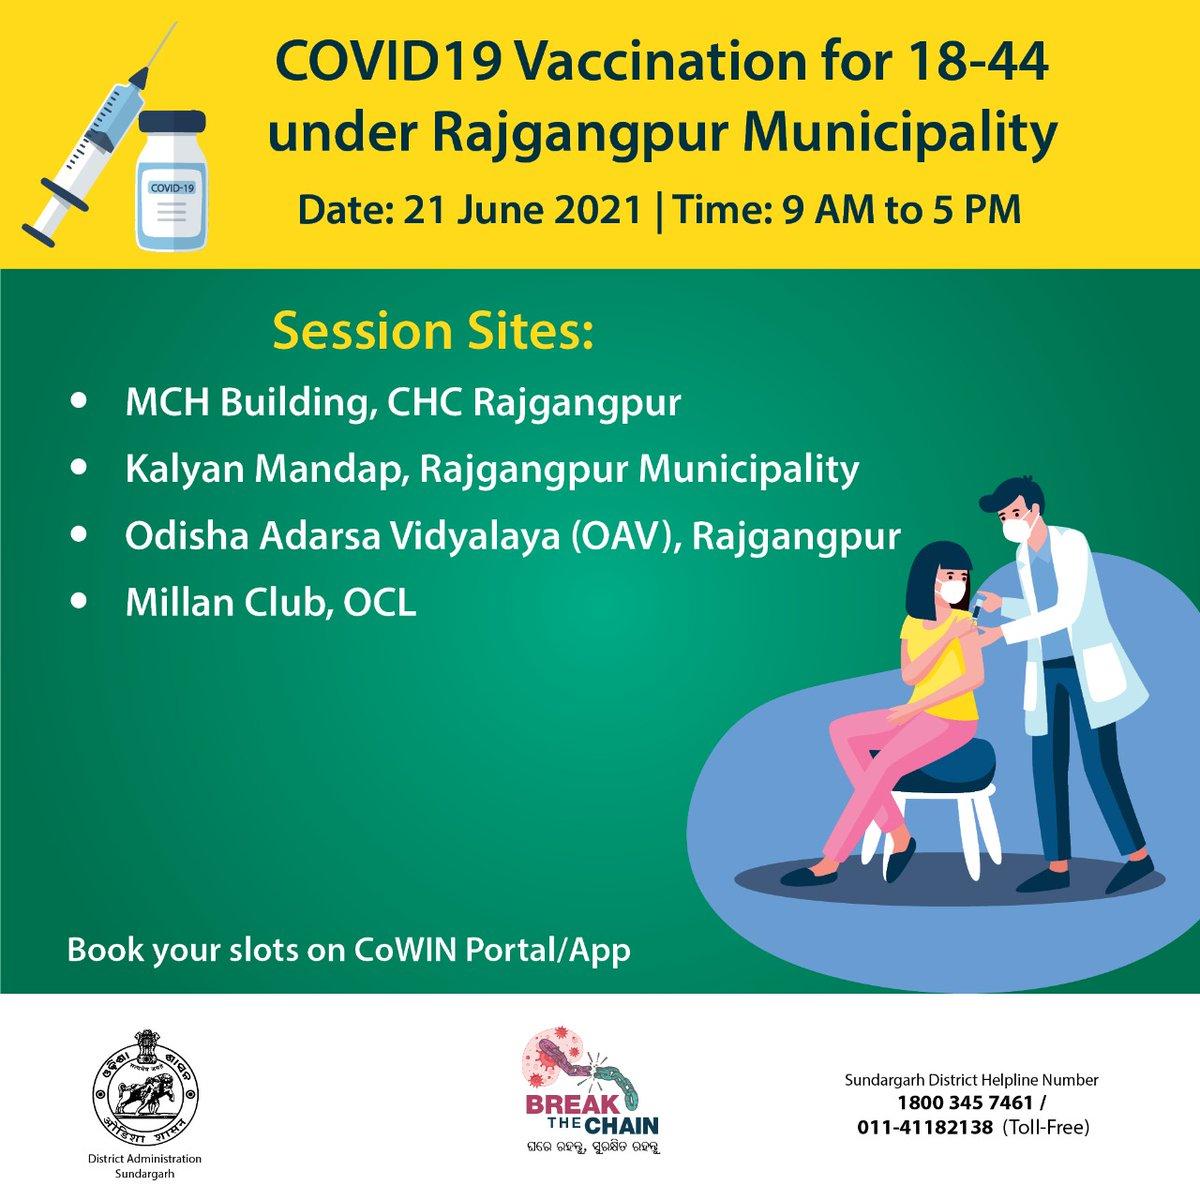 Under @Rajgangpur_Mun , individuals between 18-44 will be vaccinated against COVID19 on 21 June Monday, 9 am onwards. Beneficiaries must book their slot on CoWIN Portal/App. @CMO_Odisha @SecyChief @IPR_Odisha @HFWOdisha @MoSarkar5T @NITIAayog @PradeepJenaIAS @MoHFW_INDIA https://t.co/DhRvIFrXjc